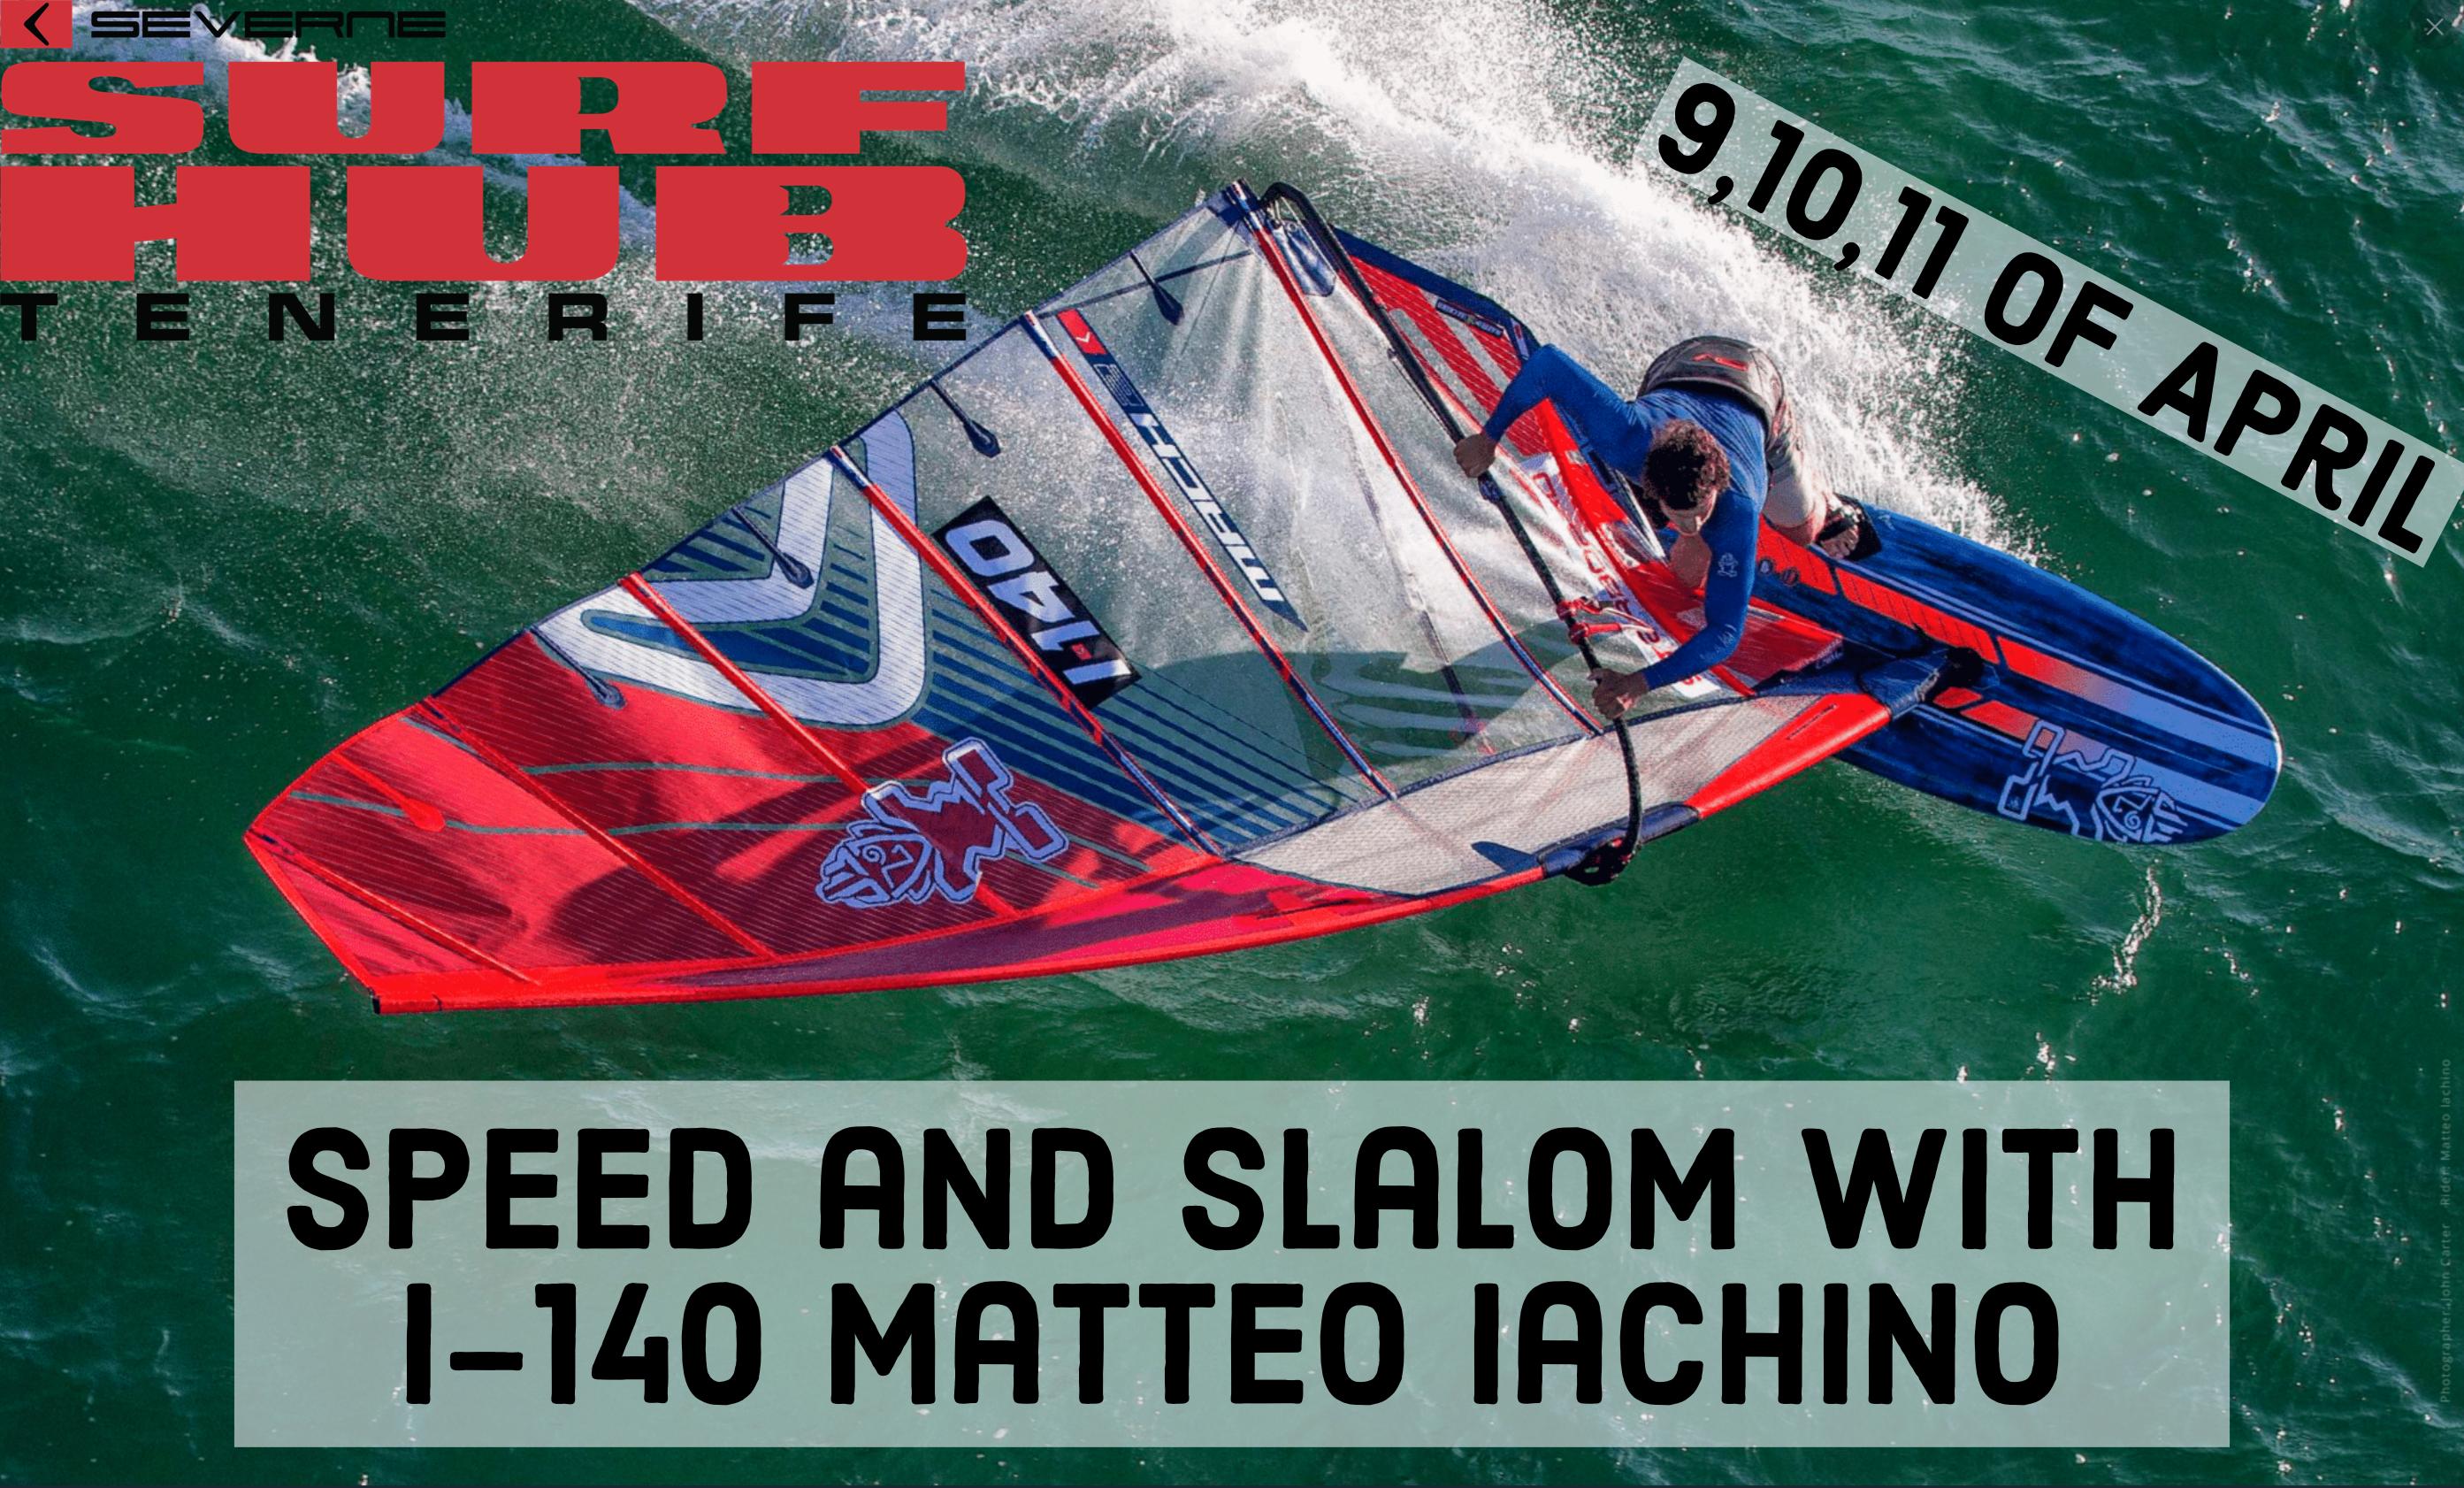 Matteo Iachino ITA140 Slalom Clinic